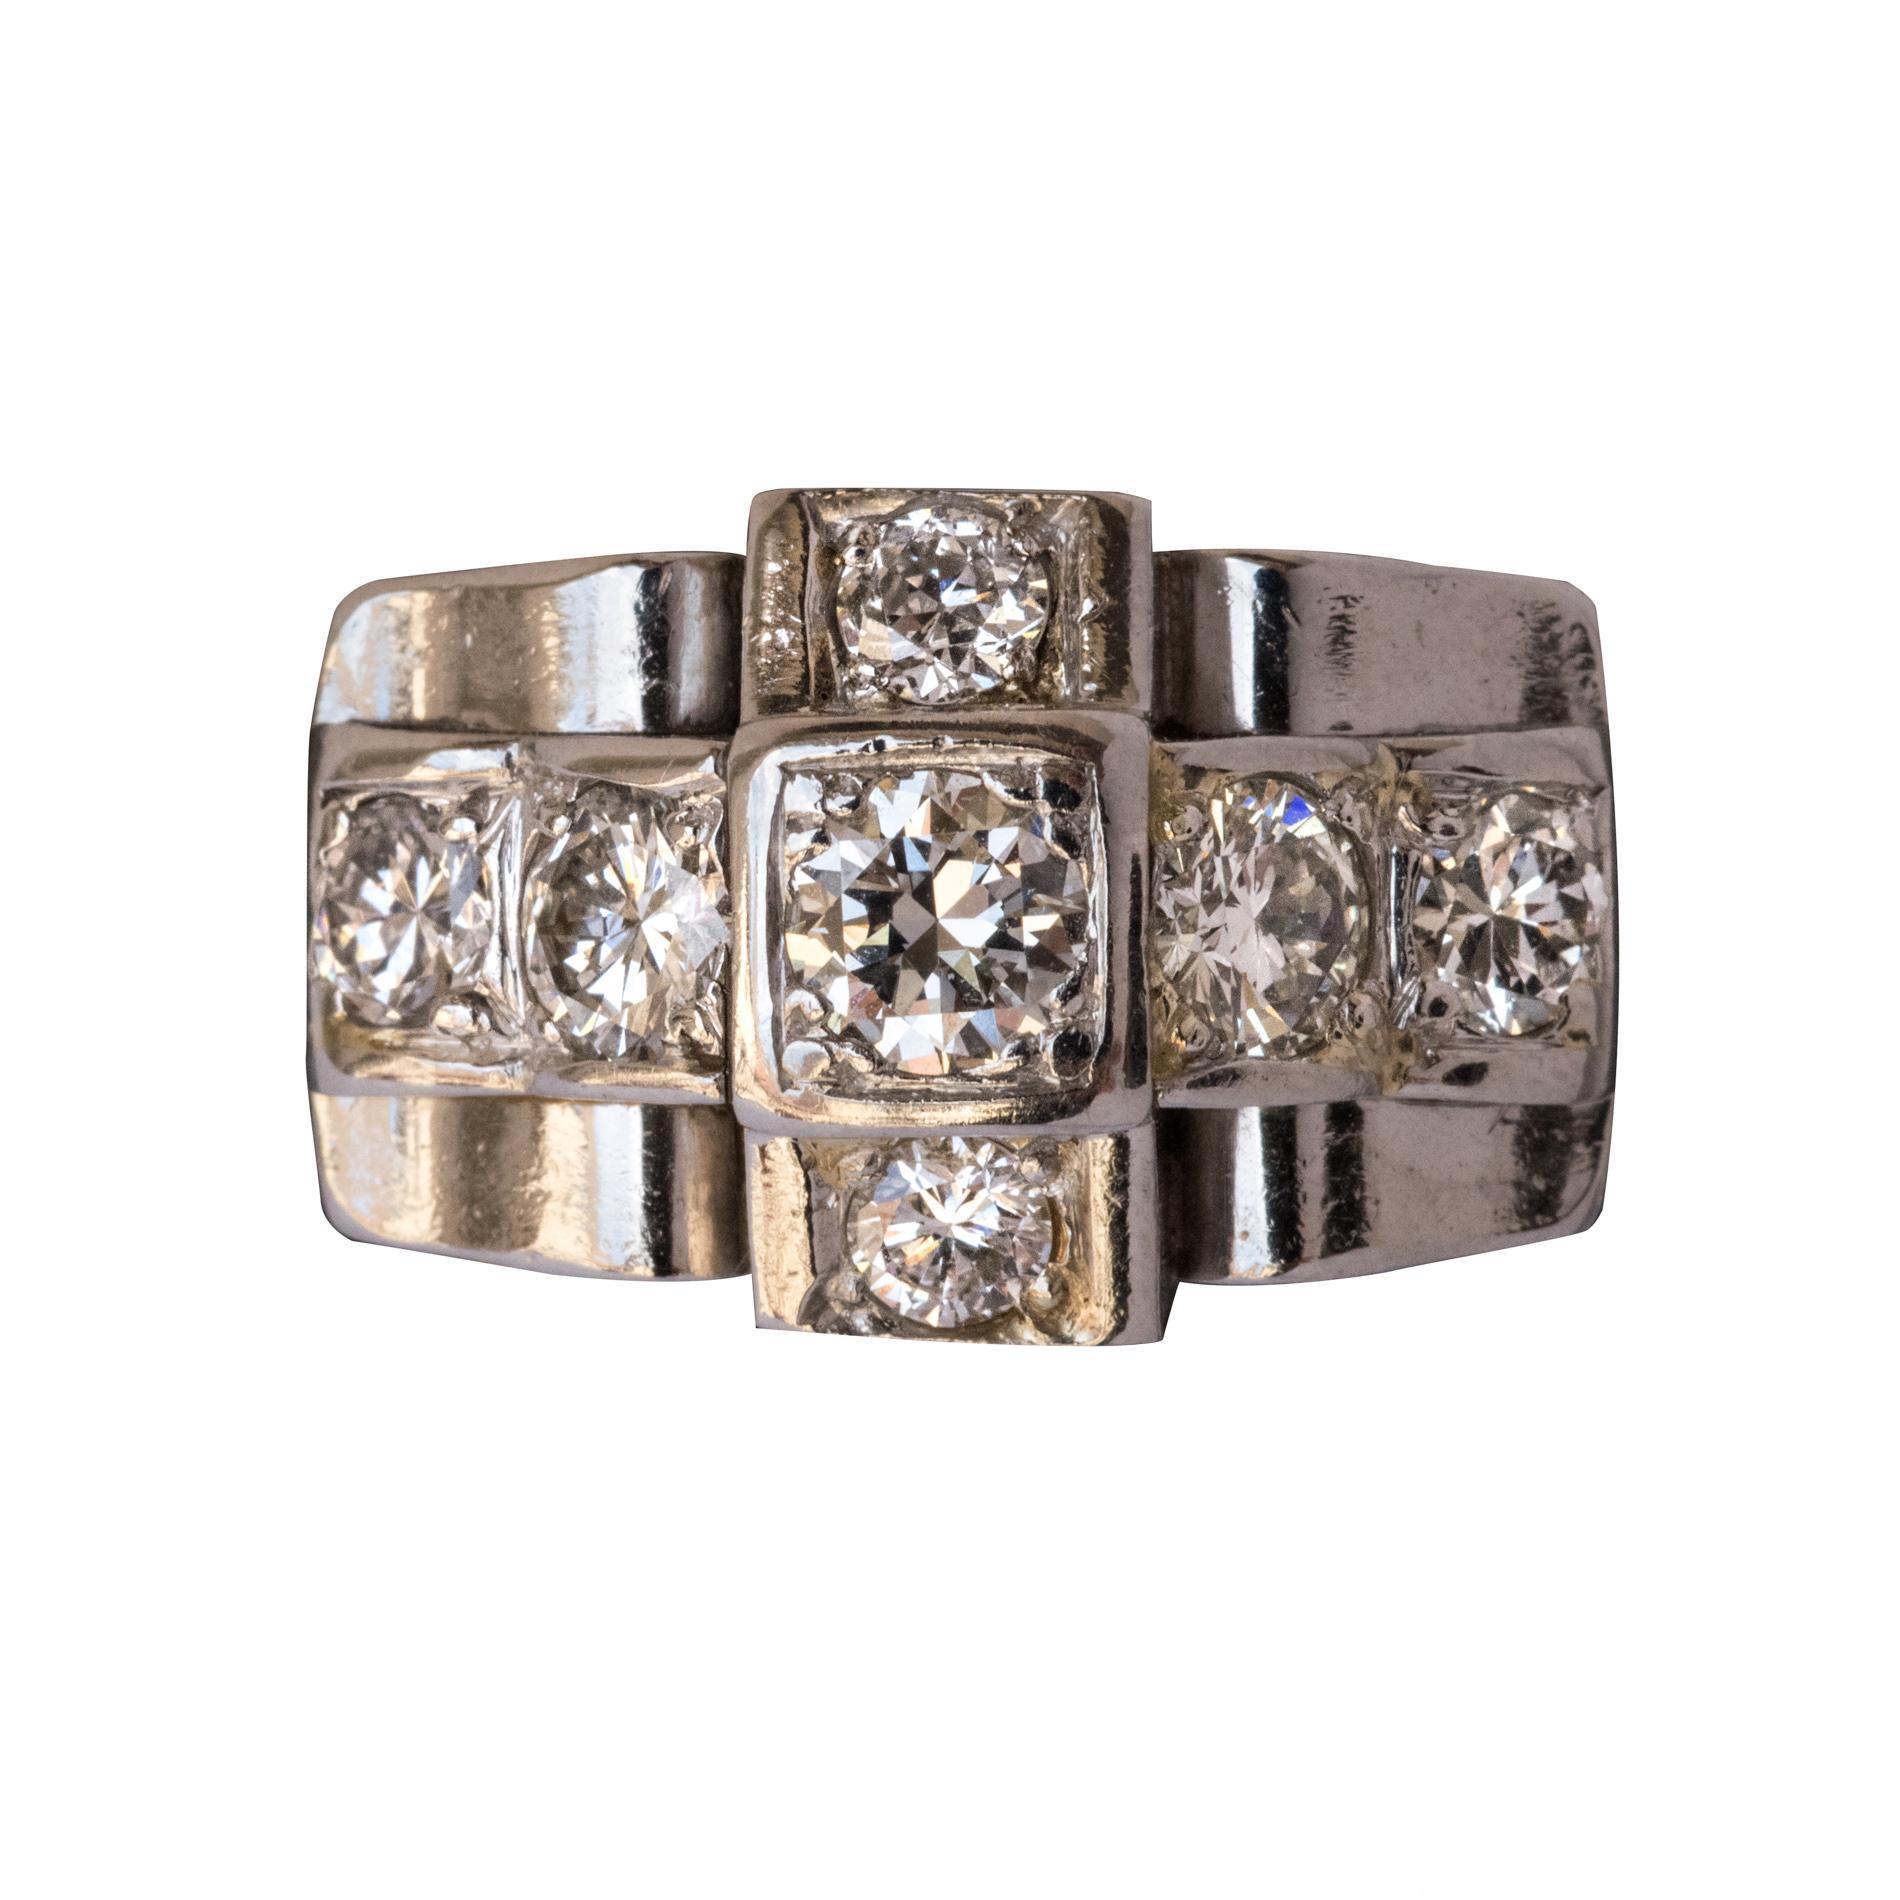 1930s Splendid French Art Deco Diamond Platinum Ring